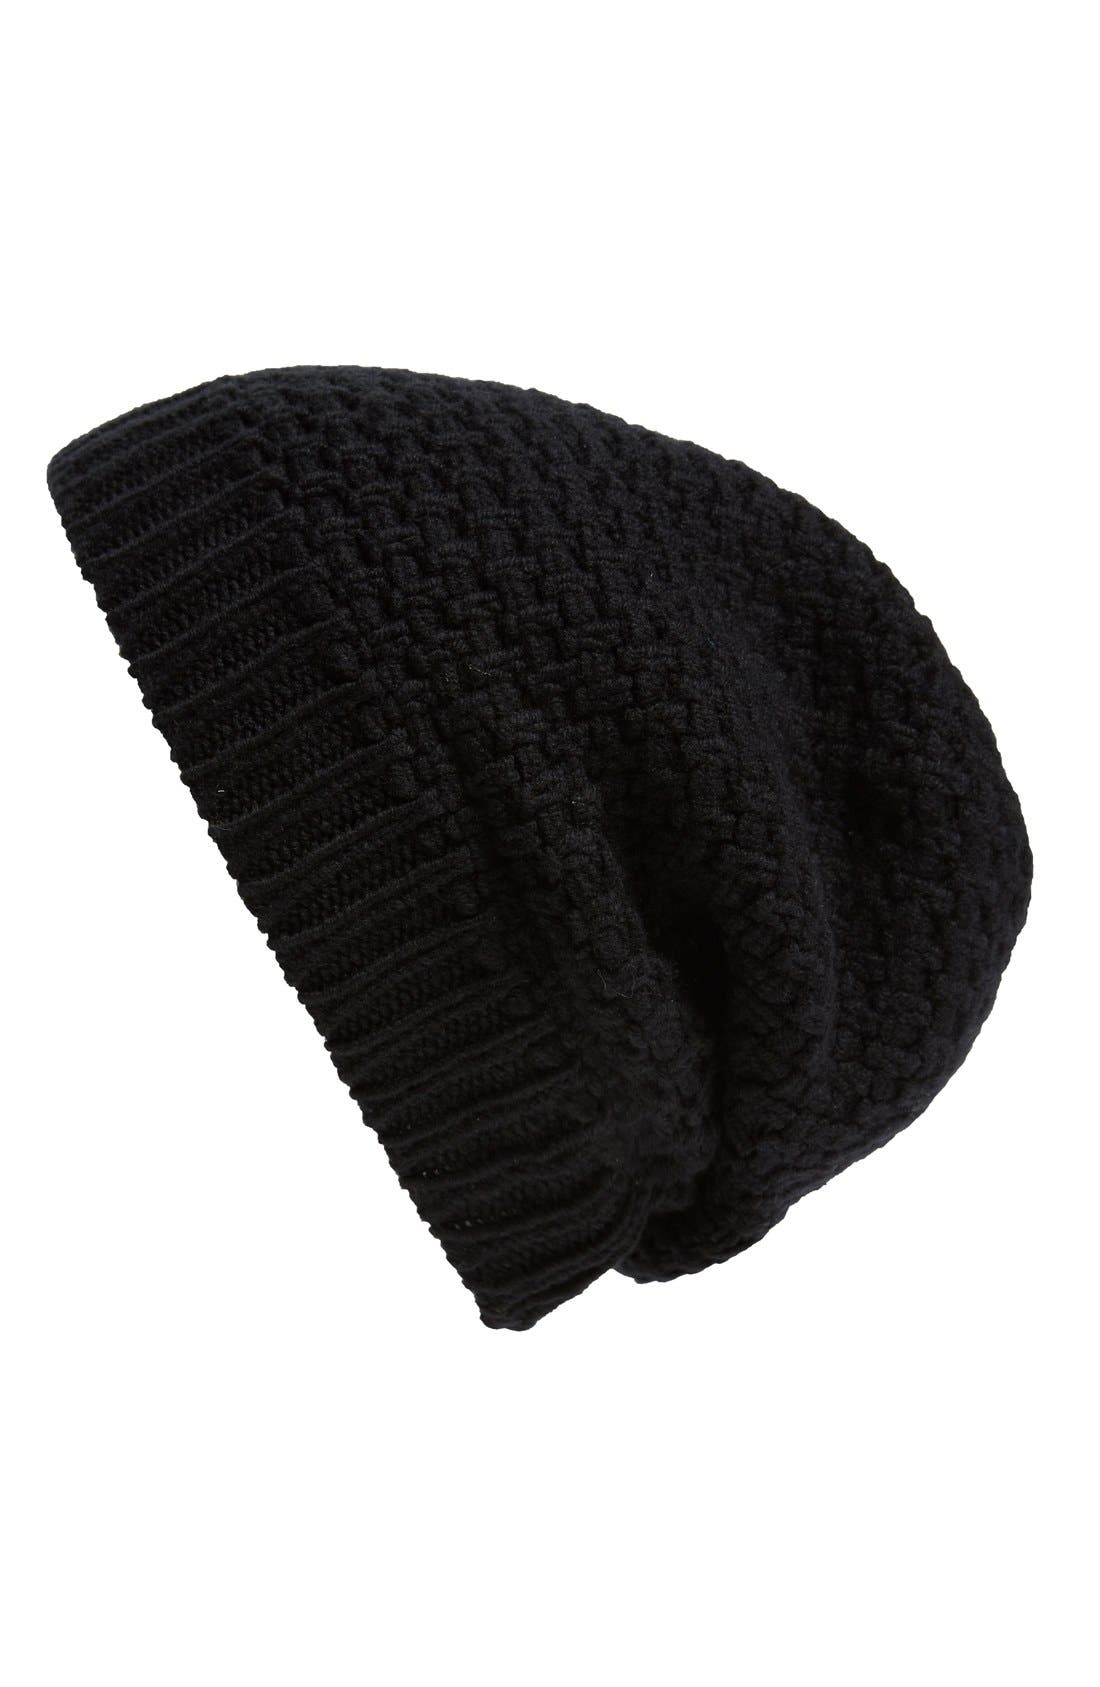 Alternate Image 1 Selected - Rick Owens Knit Wool Beanie